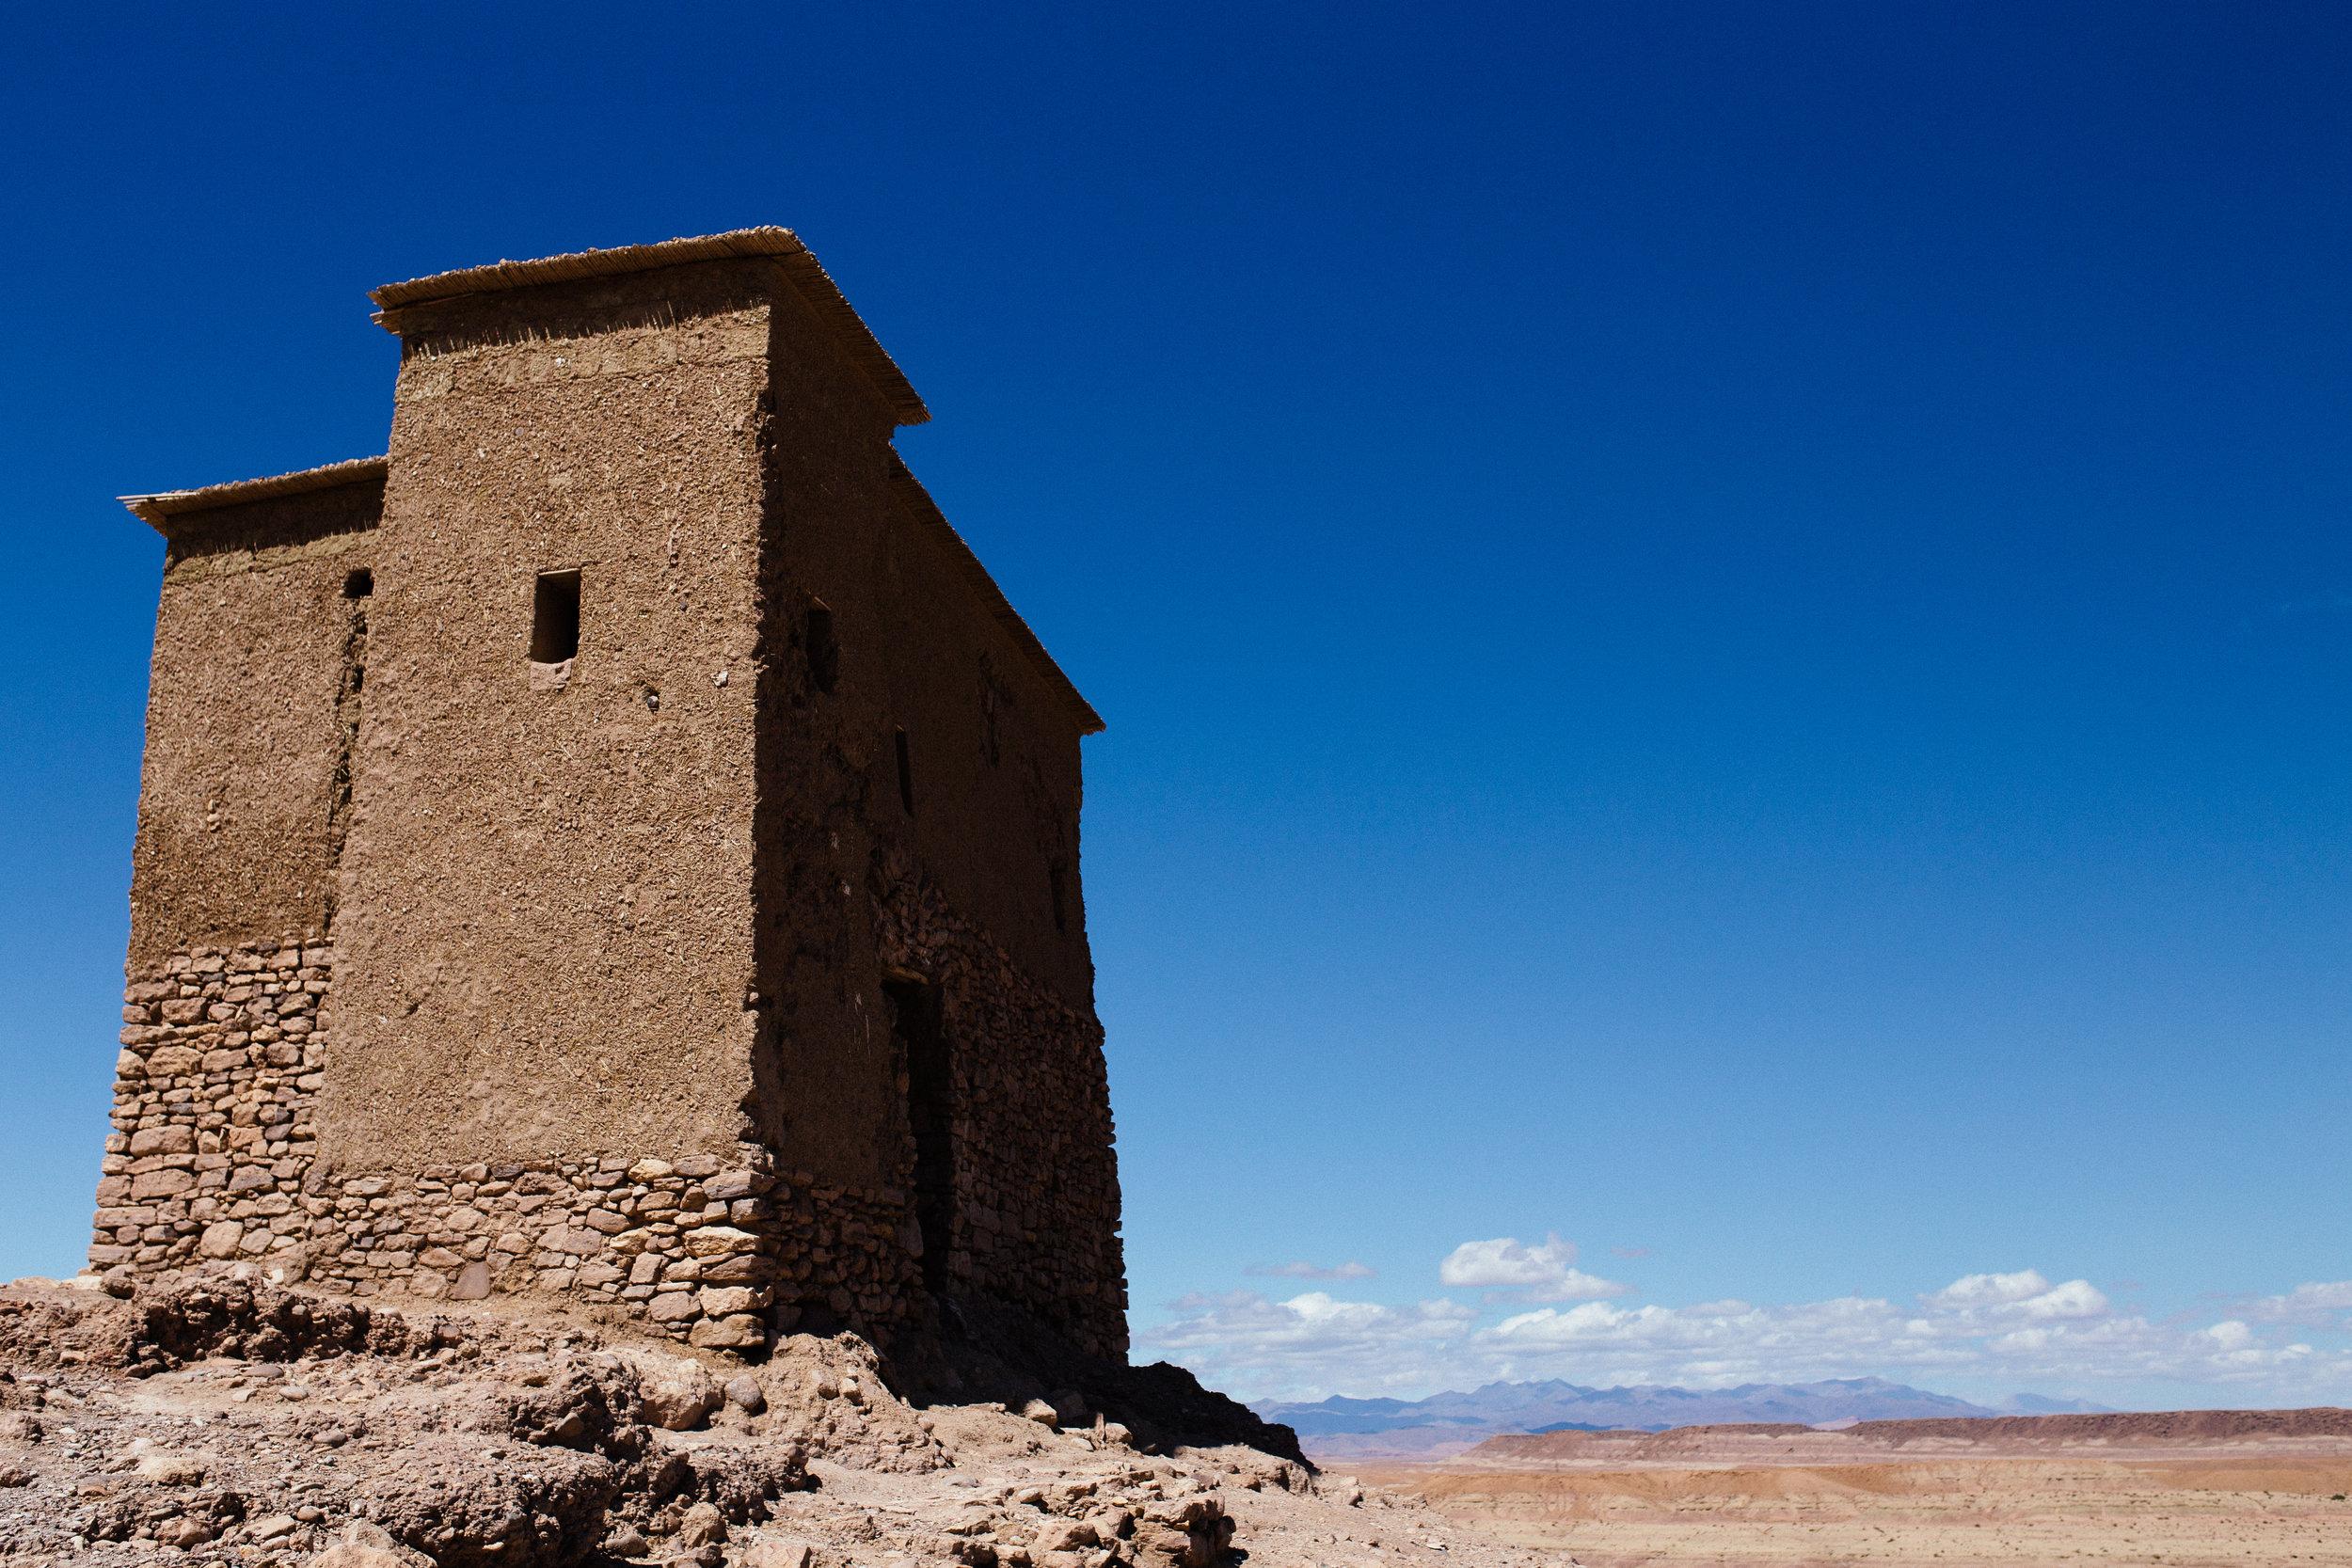 morocco-morocco travel-visit morocco-travel-travel photography-travel photographer-alina mendoza-alina mendoza photography-43.jpg